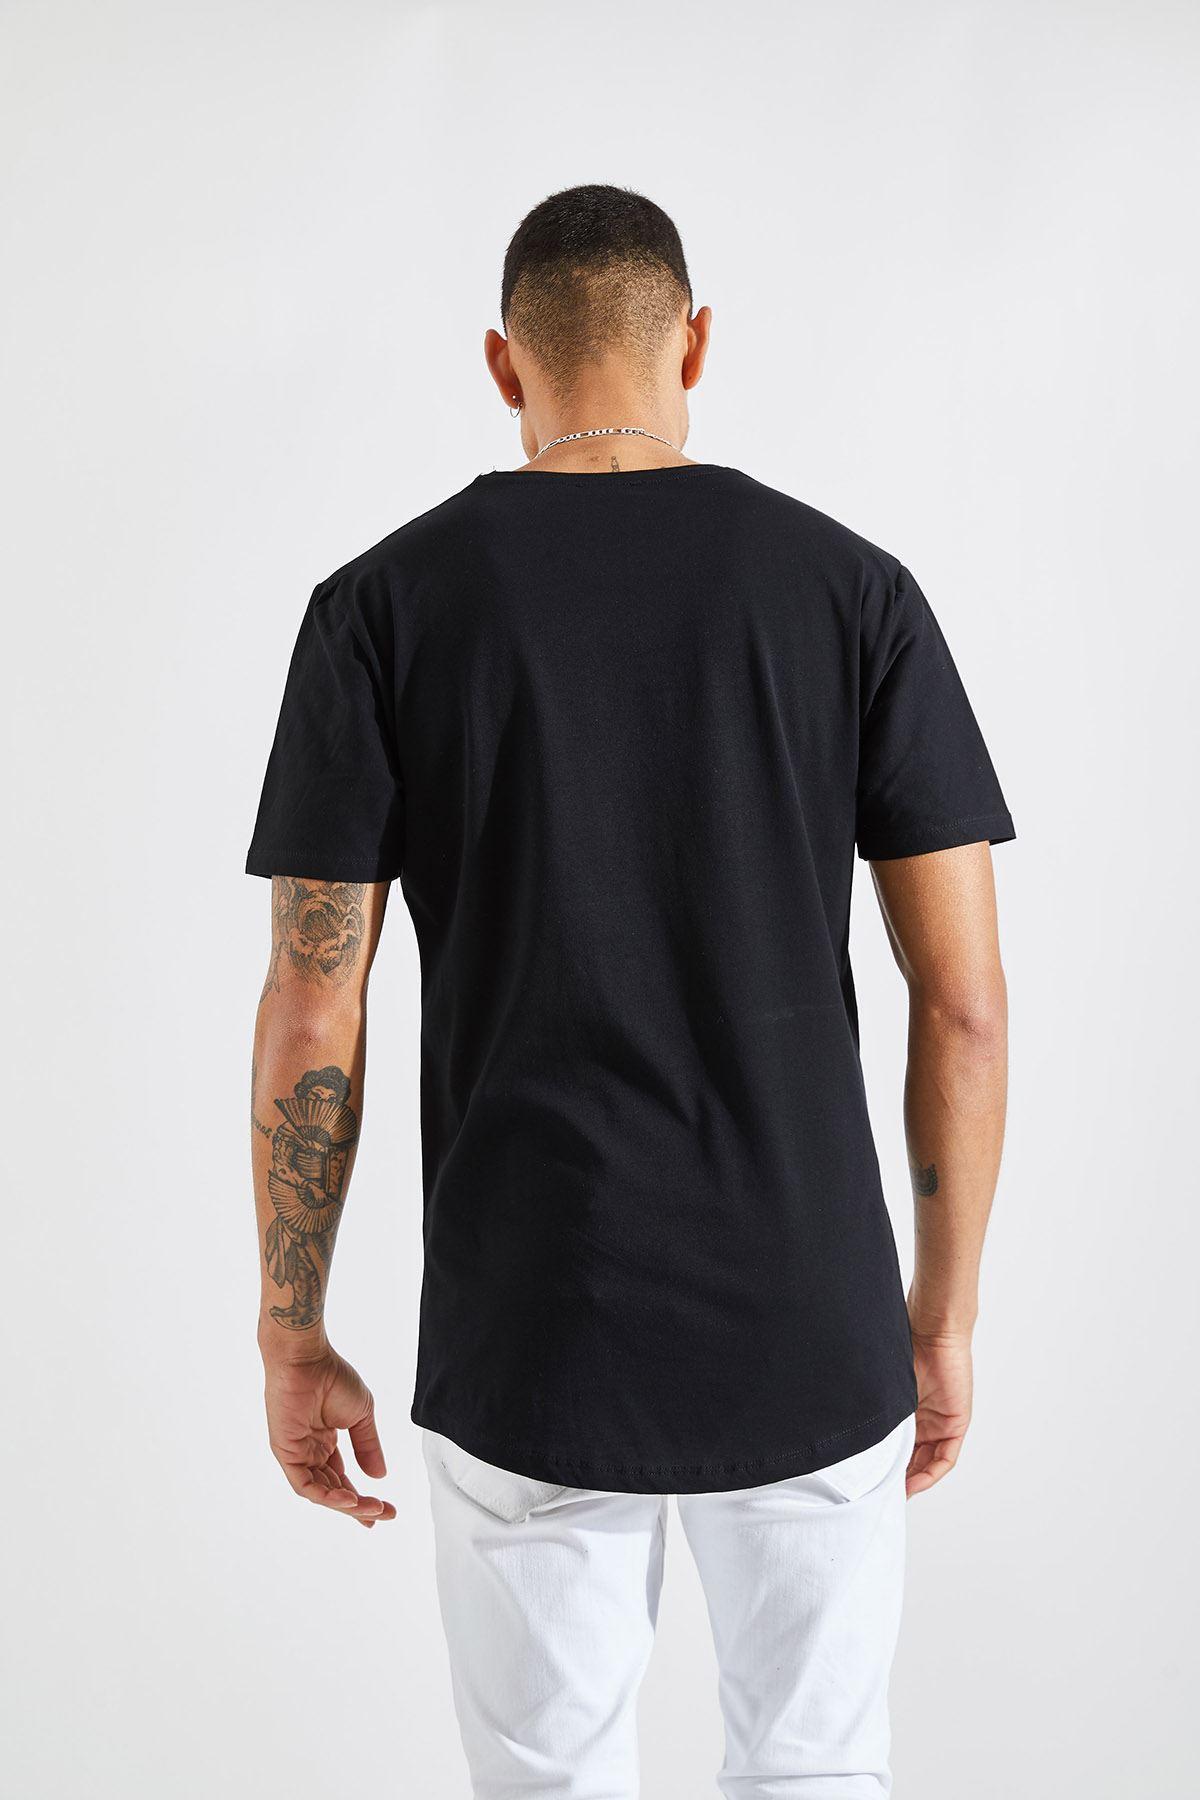 Erkek O Yaka Galata Kulesi Baskı Siyah Tişört